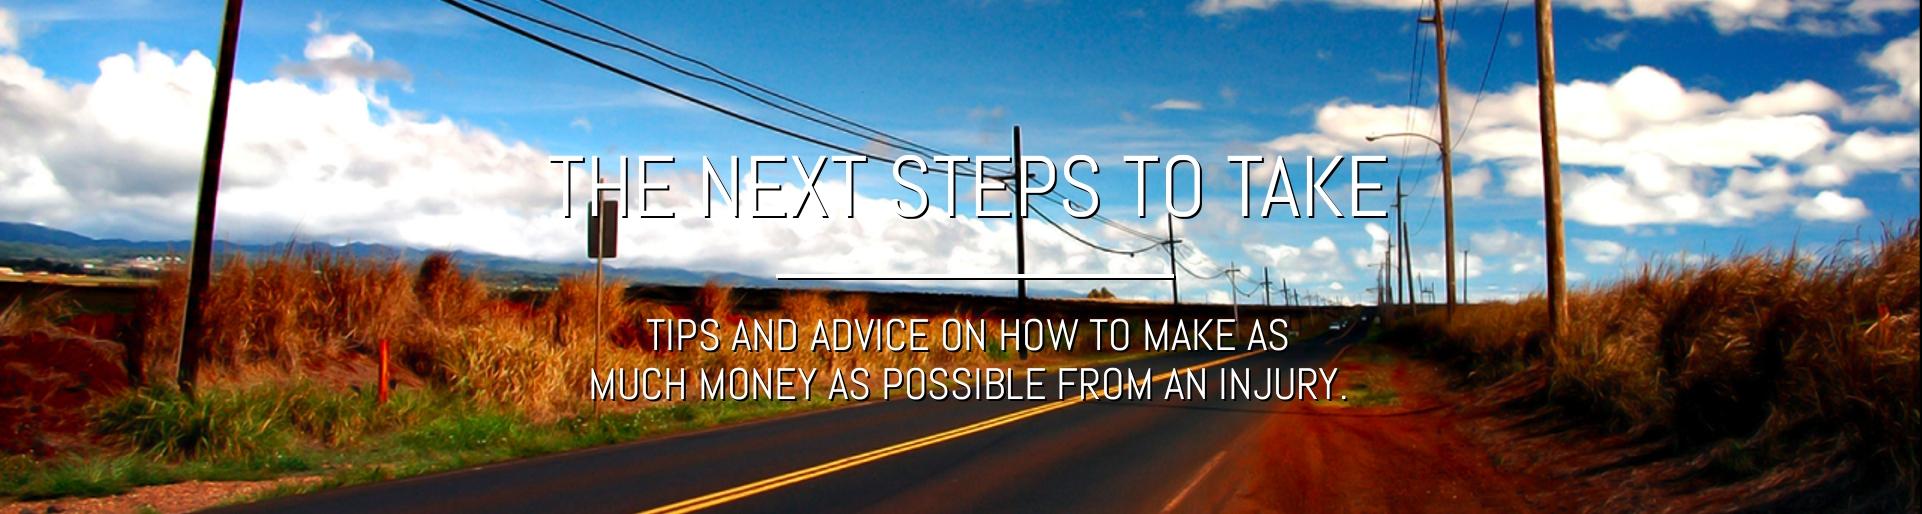 The Next Steps To Take